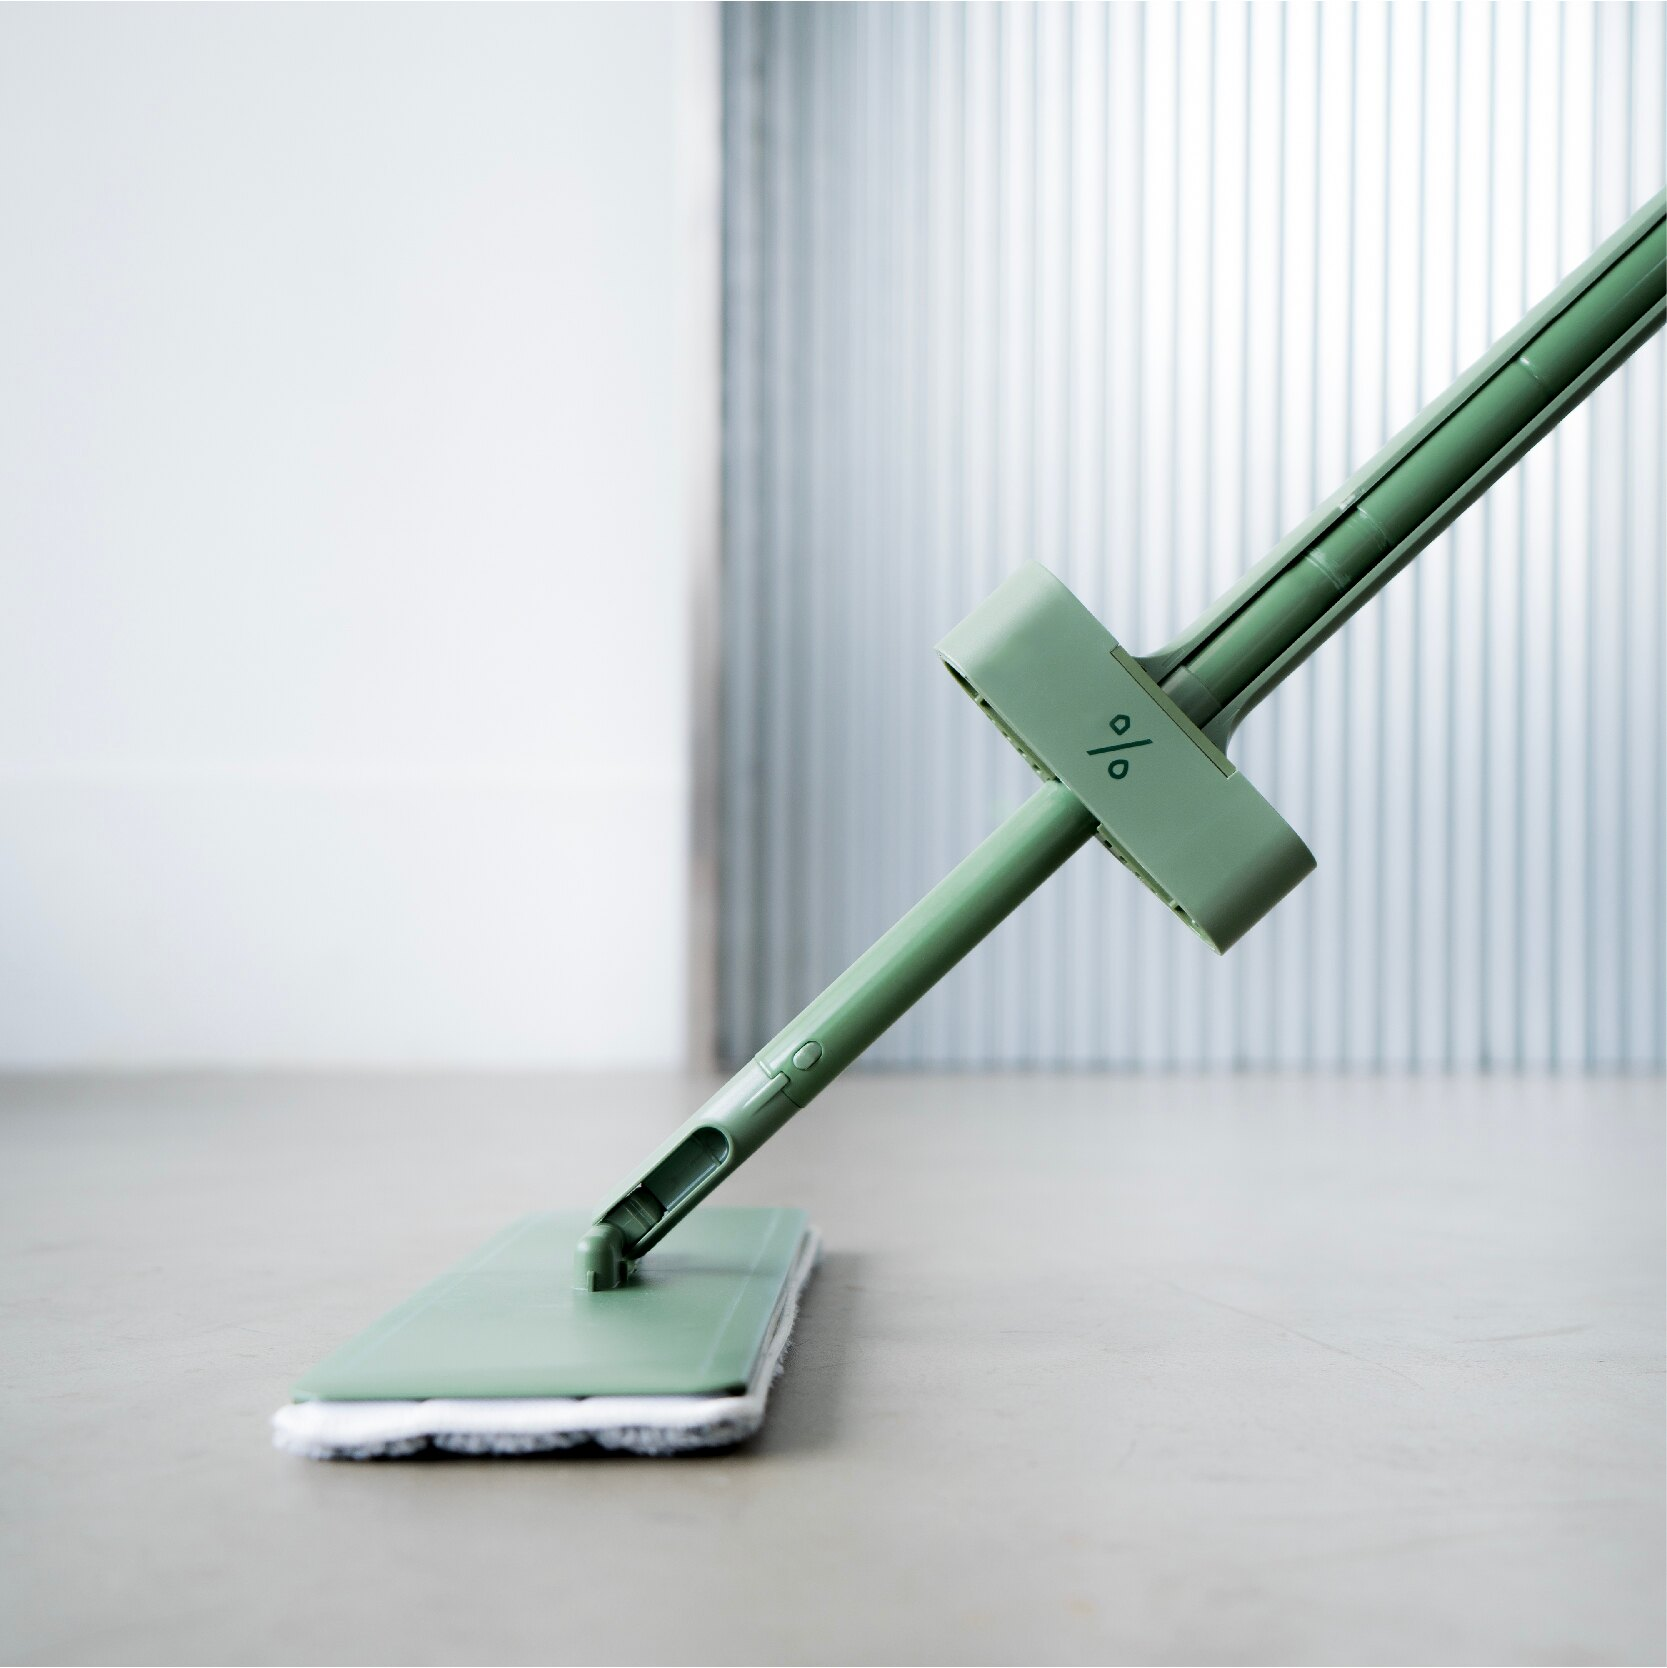 PERCENT 百潔 QUICK MOP 免手洗高效平板拖把(綠)  360度多向轉頭 推拉式刮把設計